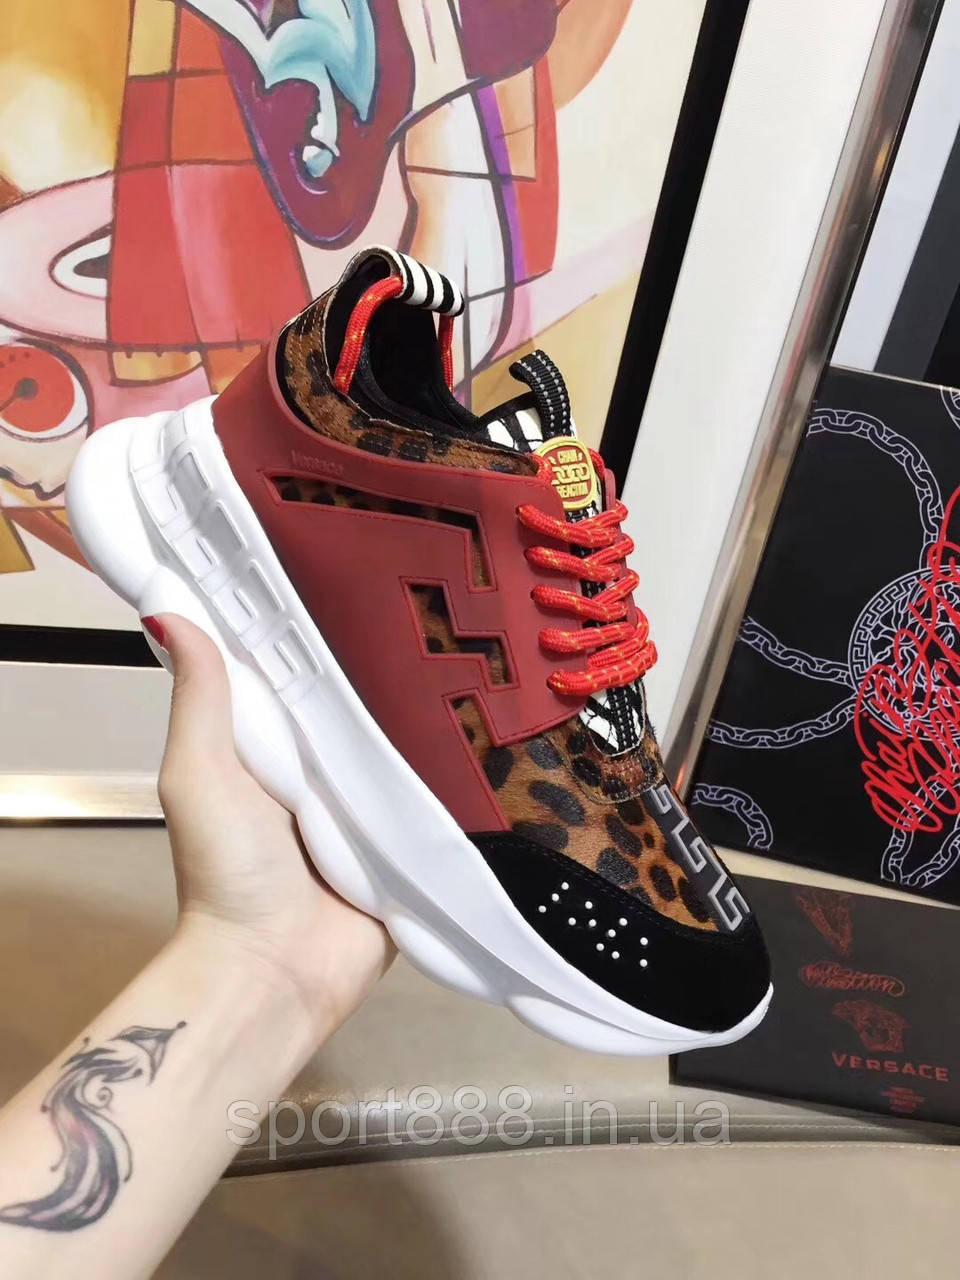 Versace Chain Reaction мужские и женские кроссовки - sport888 в Николаеве a8fe53032f8